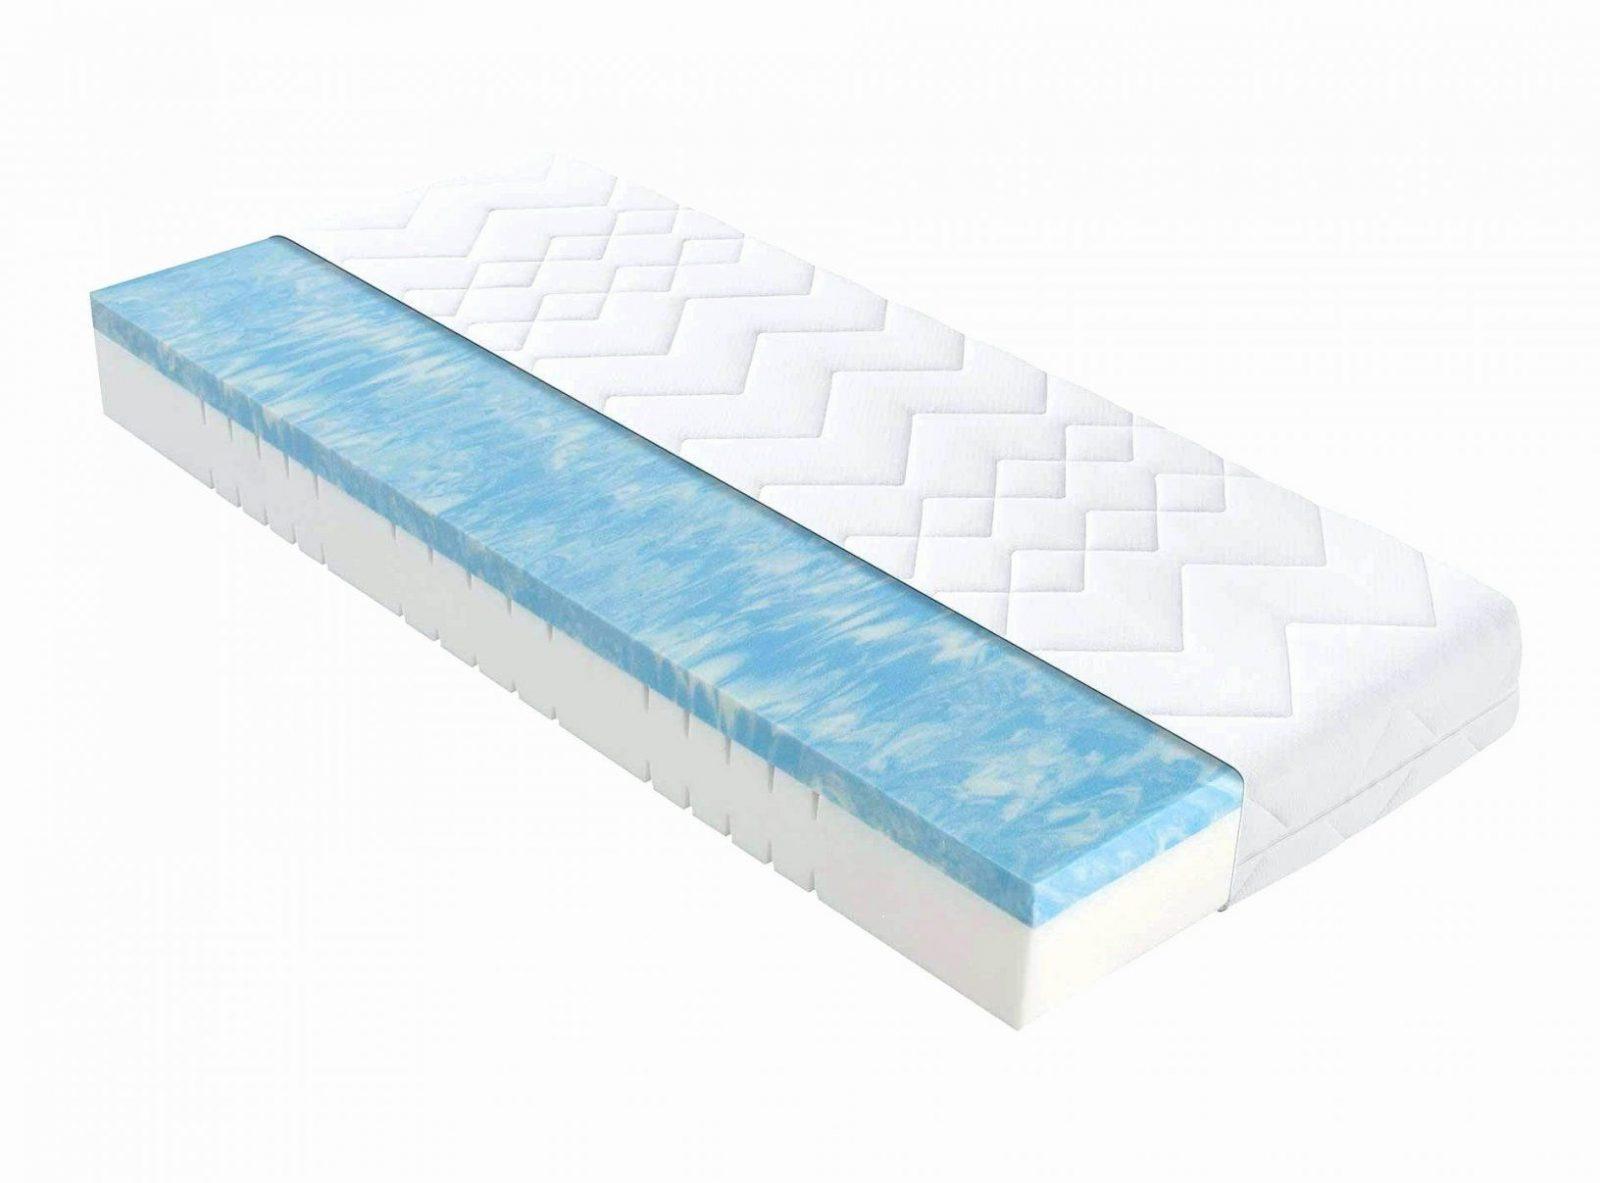 aldi nord matratze 140 200 genial unna 2018 avec photos top 20 des von aldi nord matratze. Black Bedroom Furniture Sets. Home Design Ideas